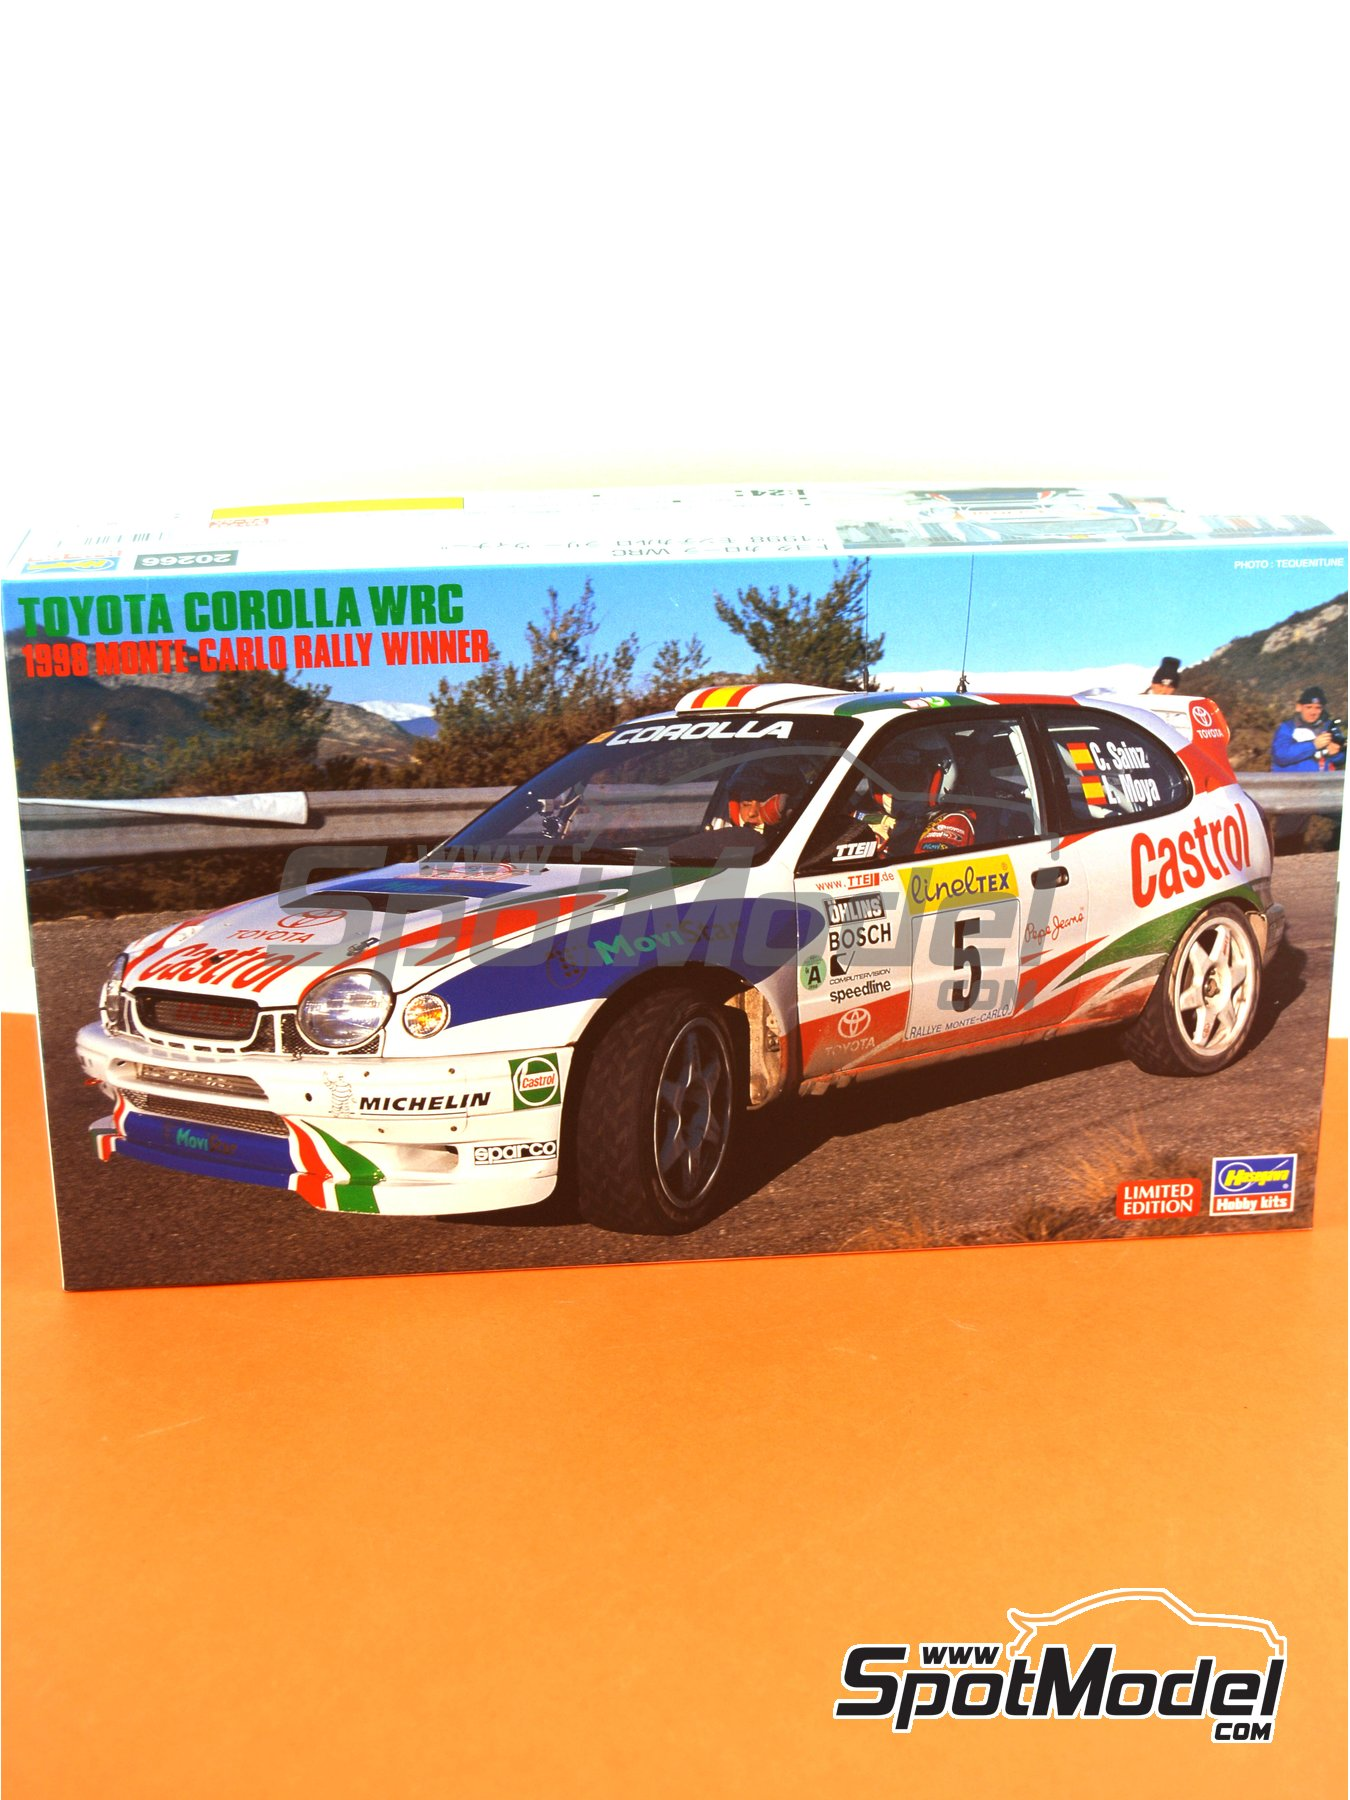 Toyota Corolla WRC - Montecarlo Rally 1998 | Model car kit in 1/24 scale manufactured by Hasegawa (ref.20266) image